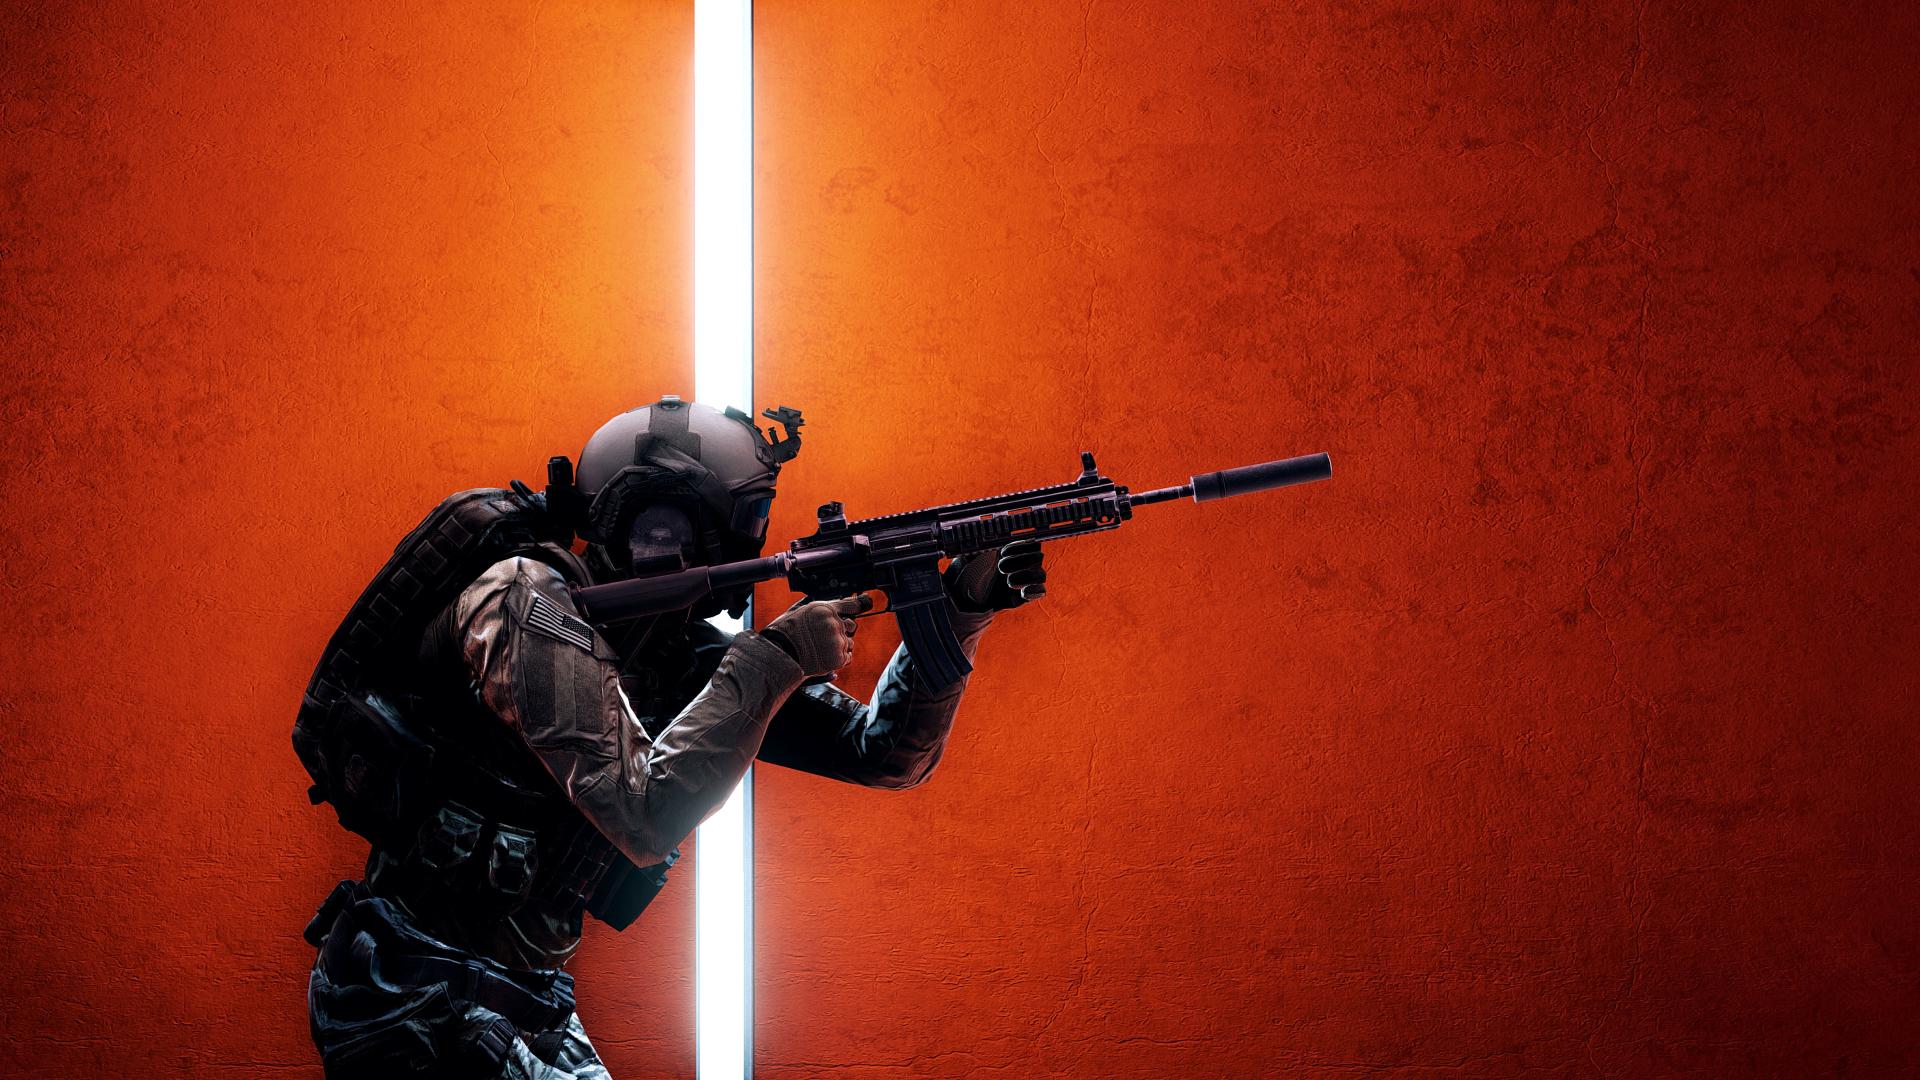 1920x1080 Battlefield 4 1080p Laptop Full Hd Wallpaper Hd Games